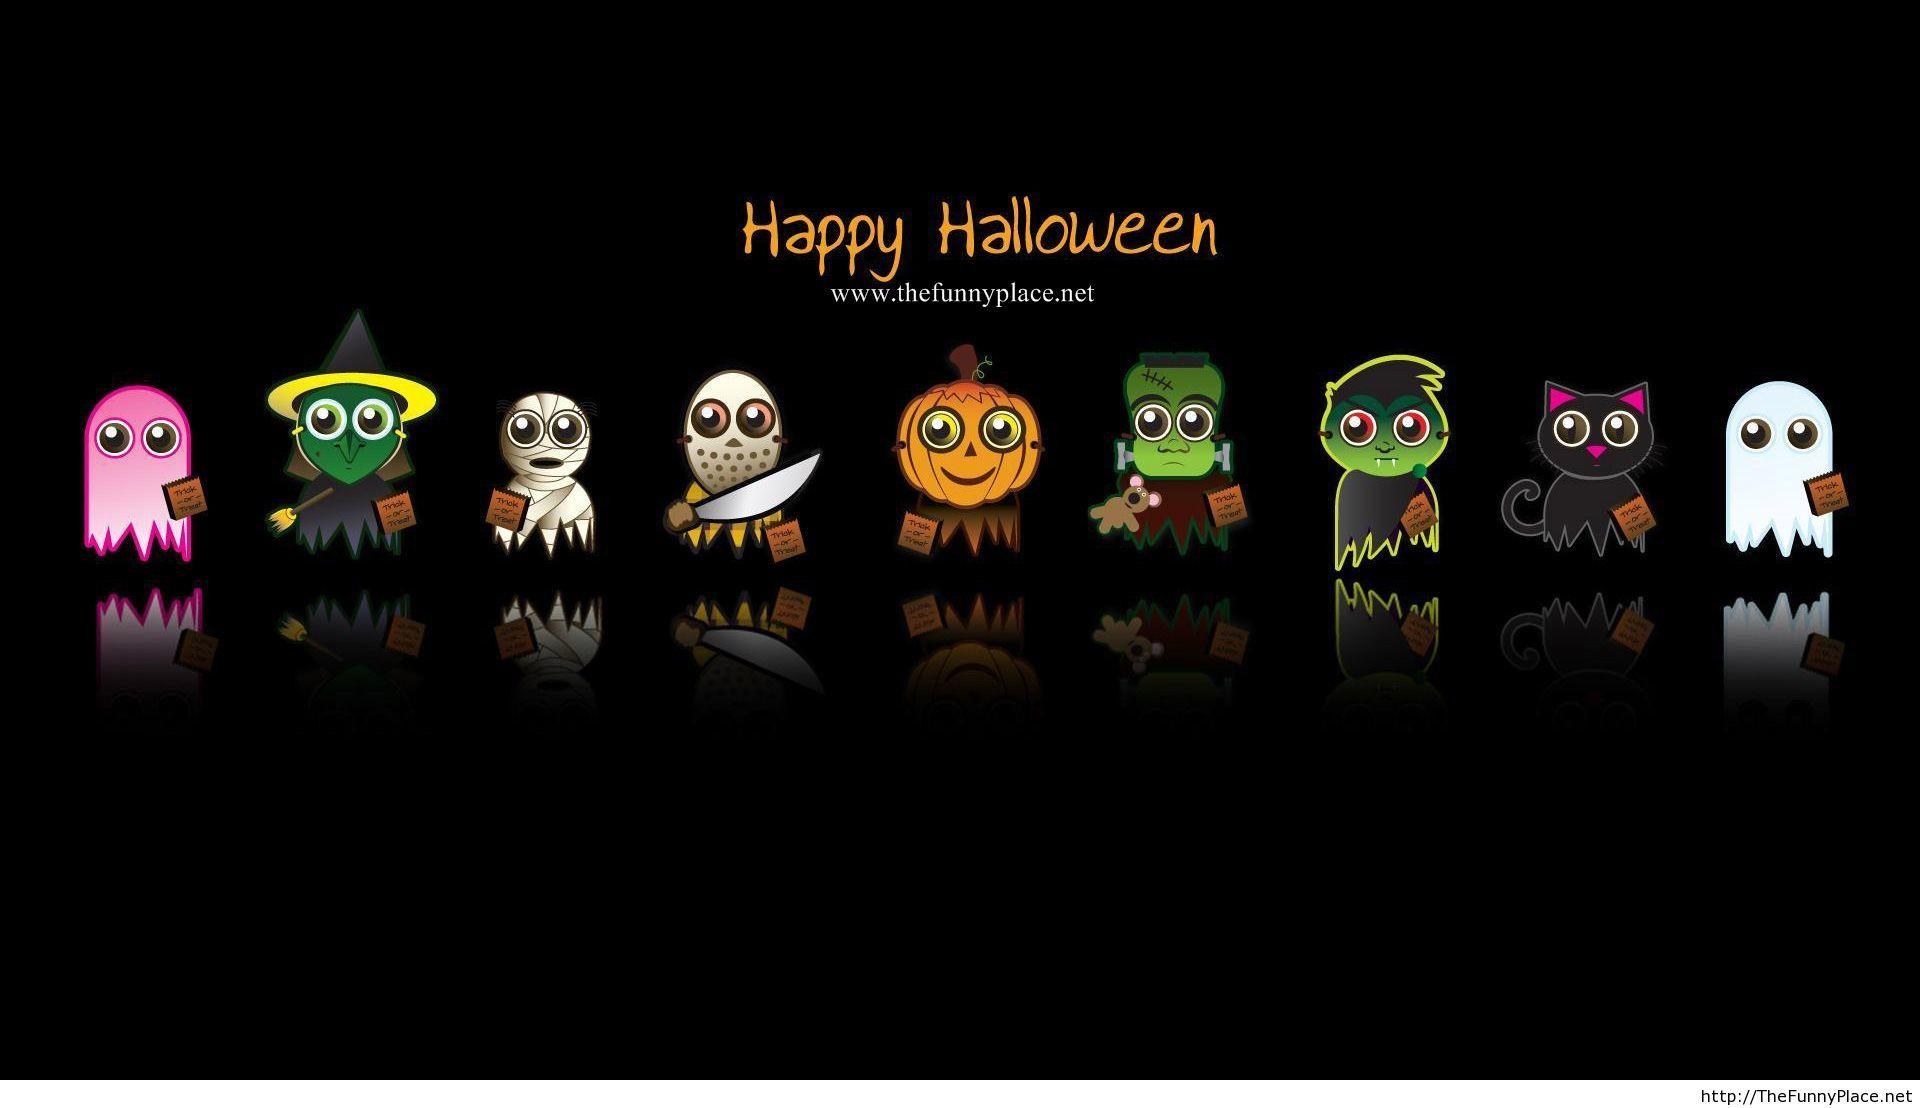 Happy Halloween HD wallpaper funny